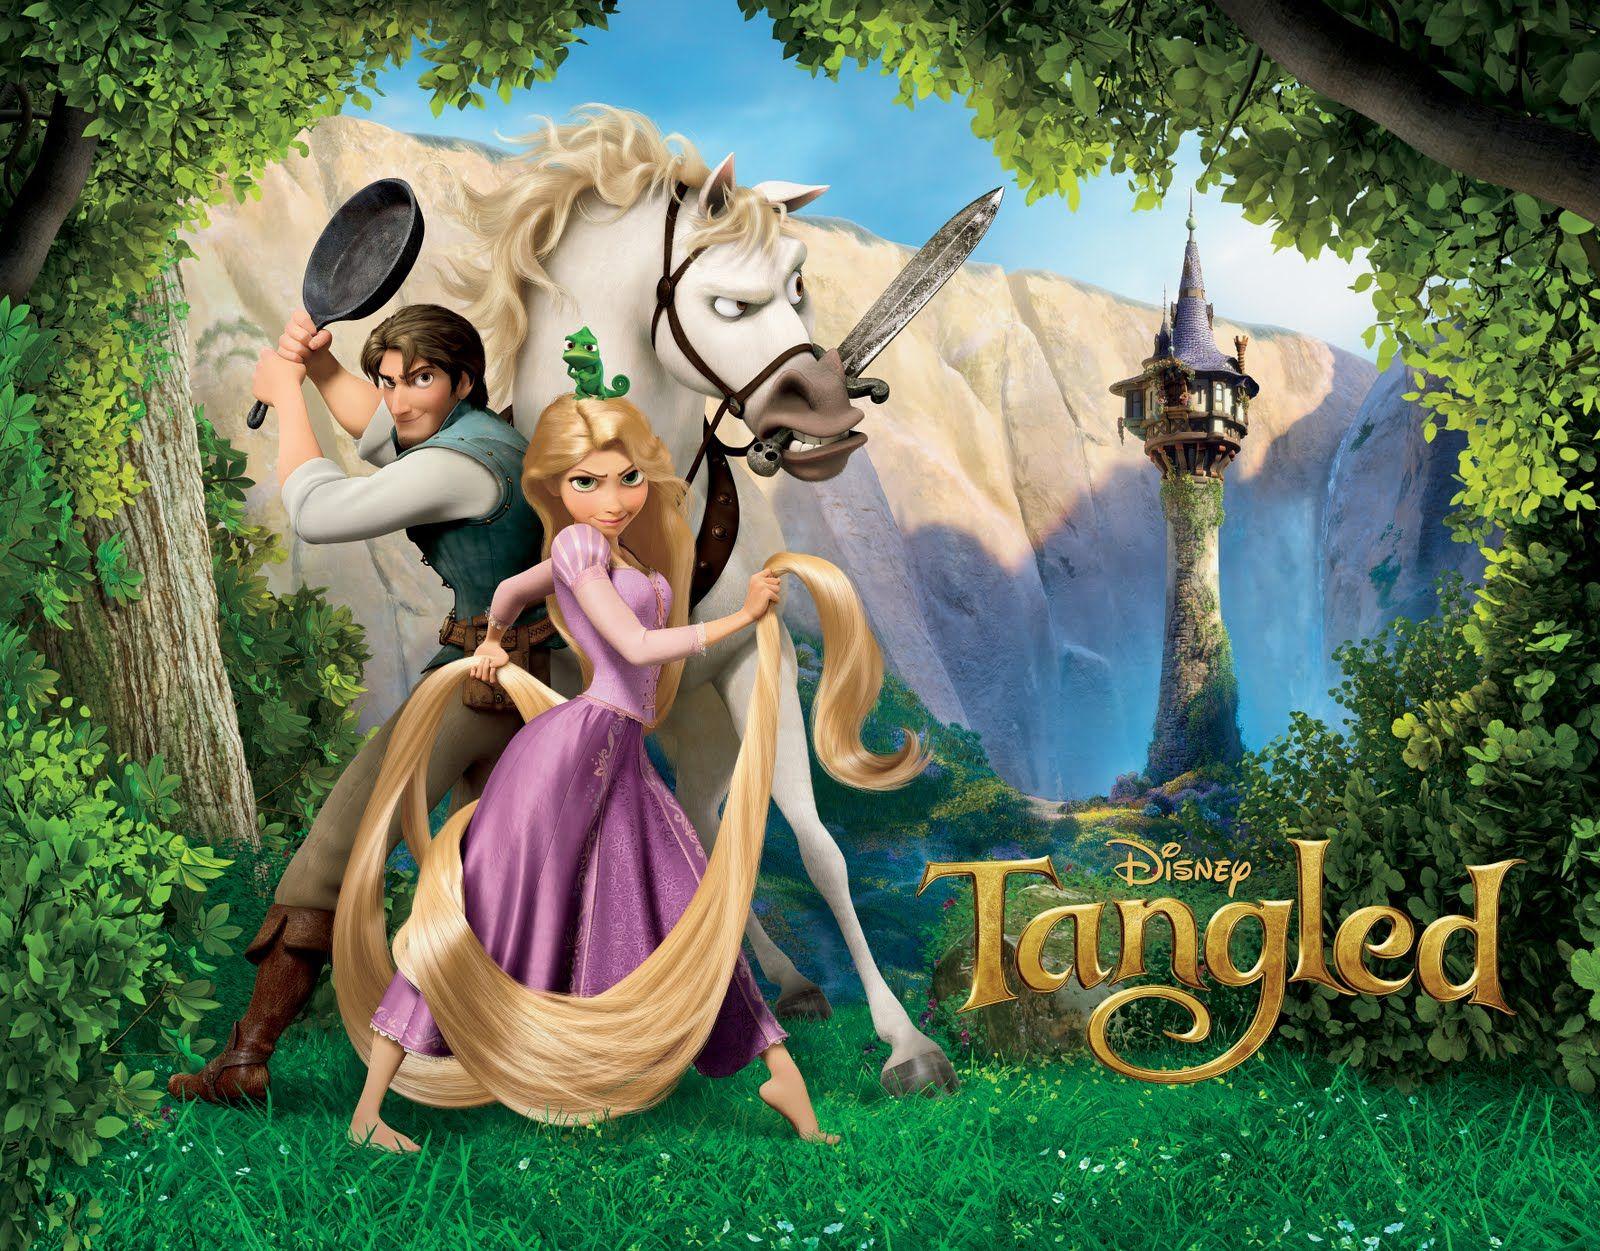 Tangled Tangled Wallpaper Tangled Princess Disney Princess Wallpaper